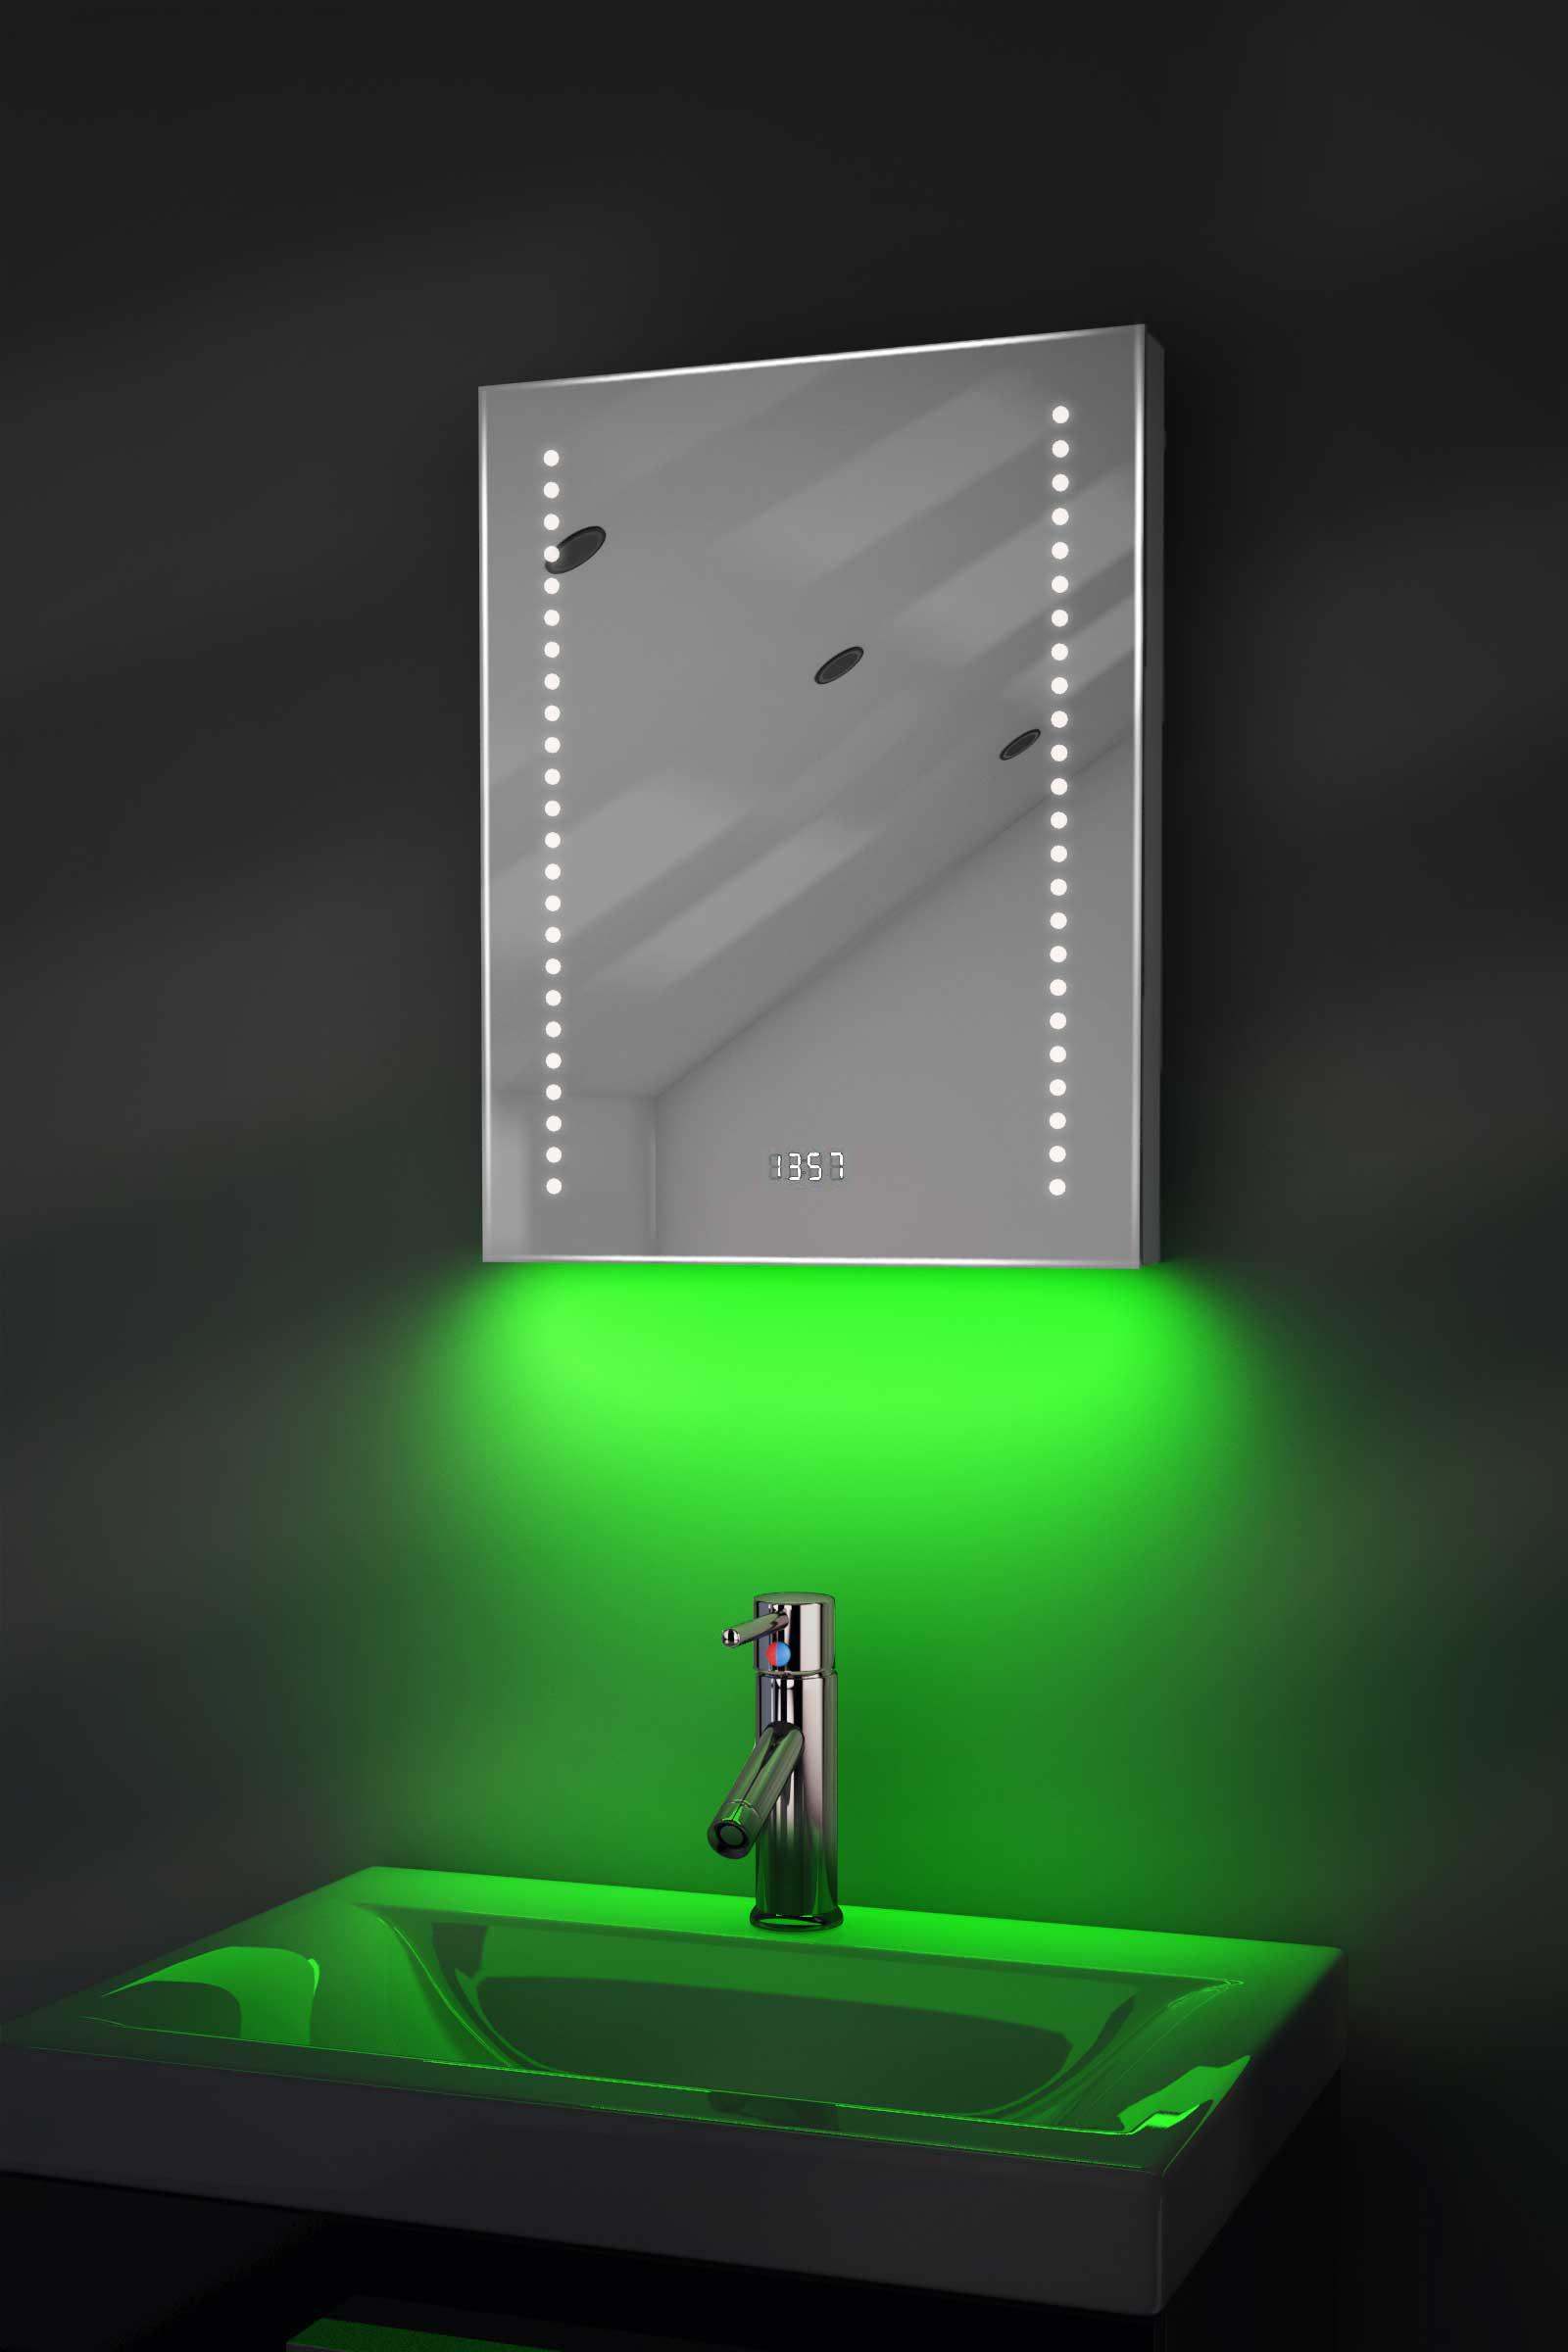 Bathroom Mirror Clock Bathroom Mirror Clock Illuminated